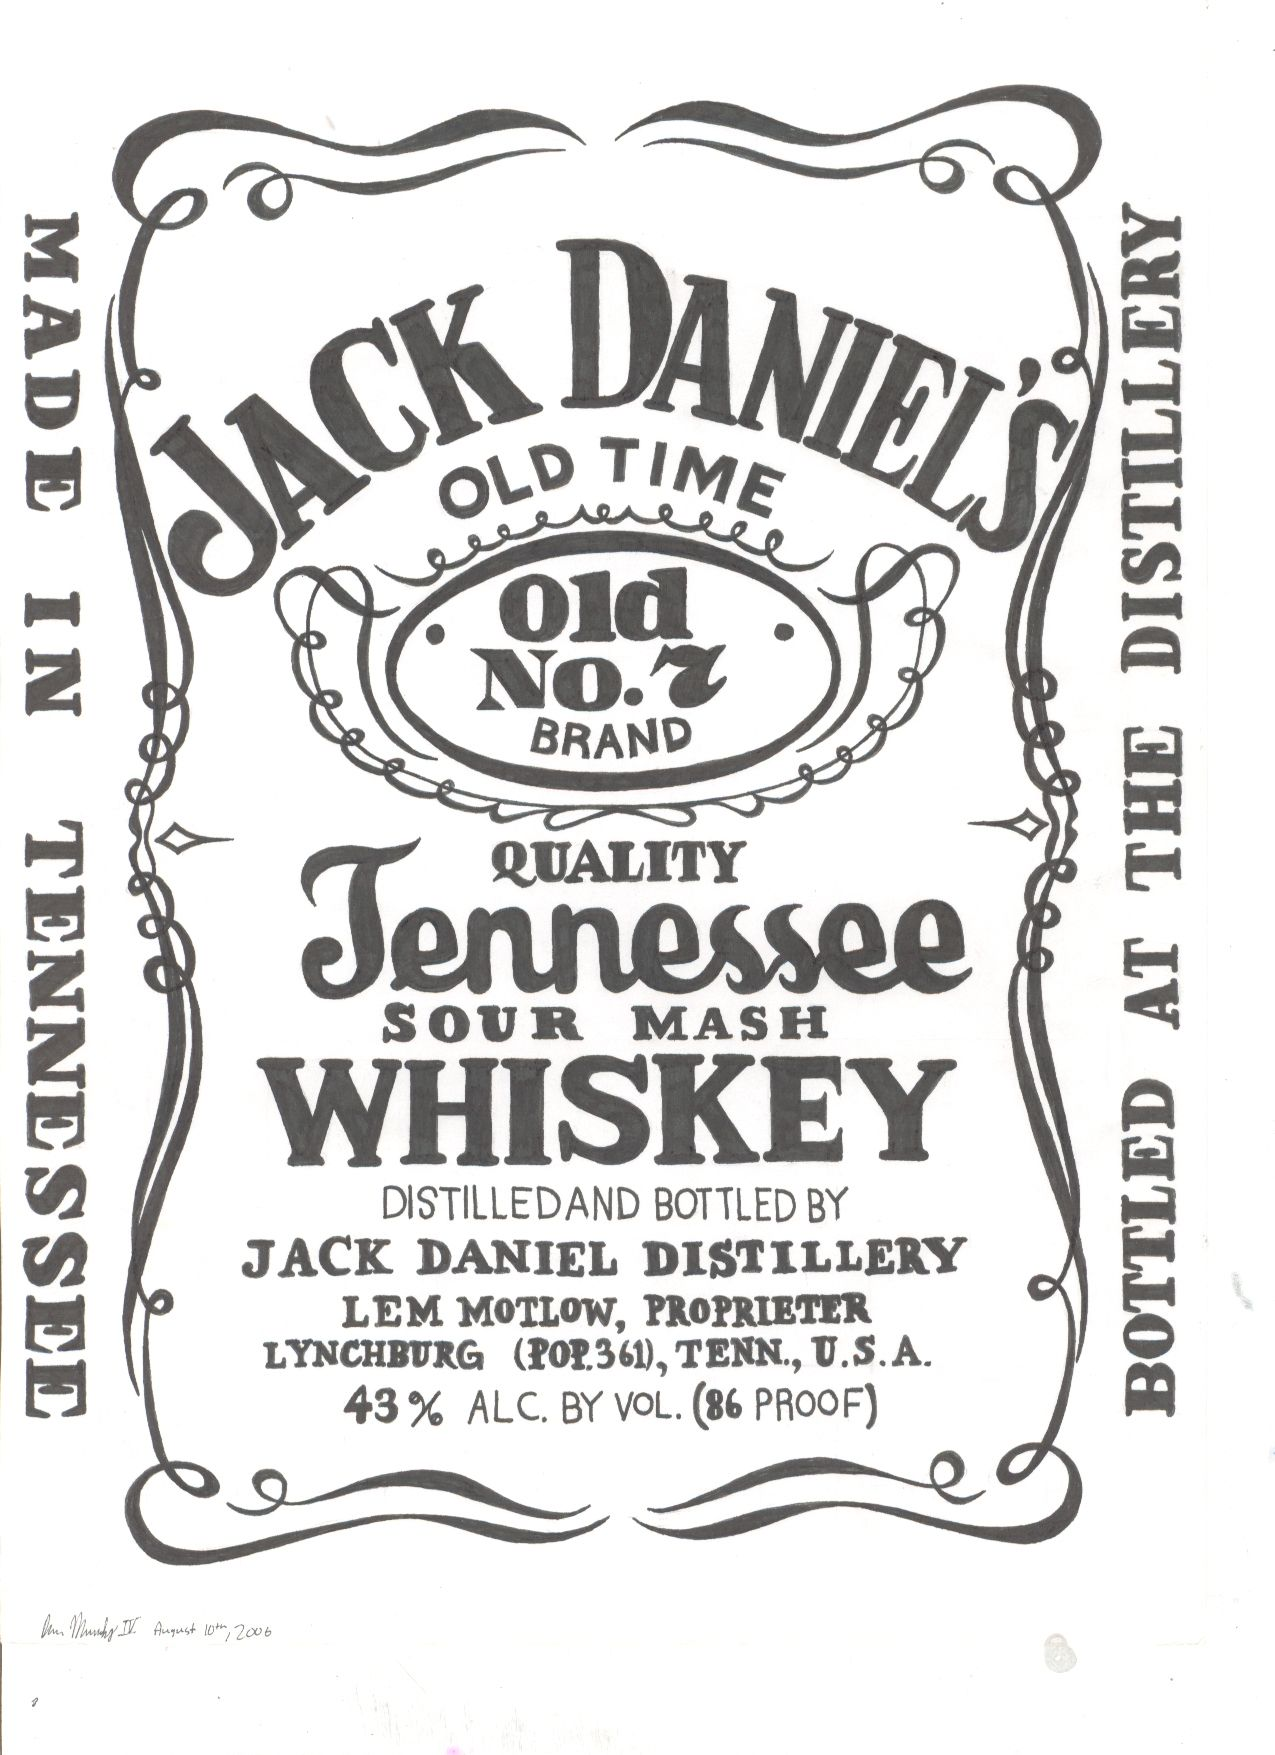 jack daniels logo stencil - Google Search